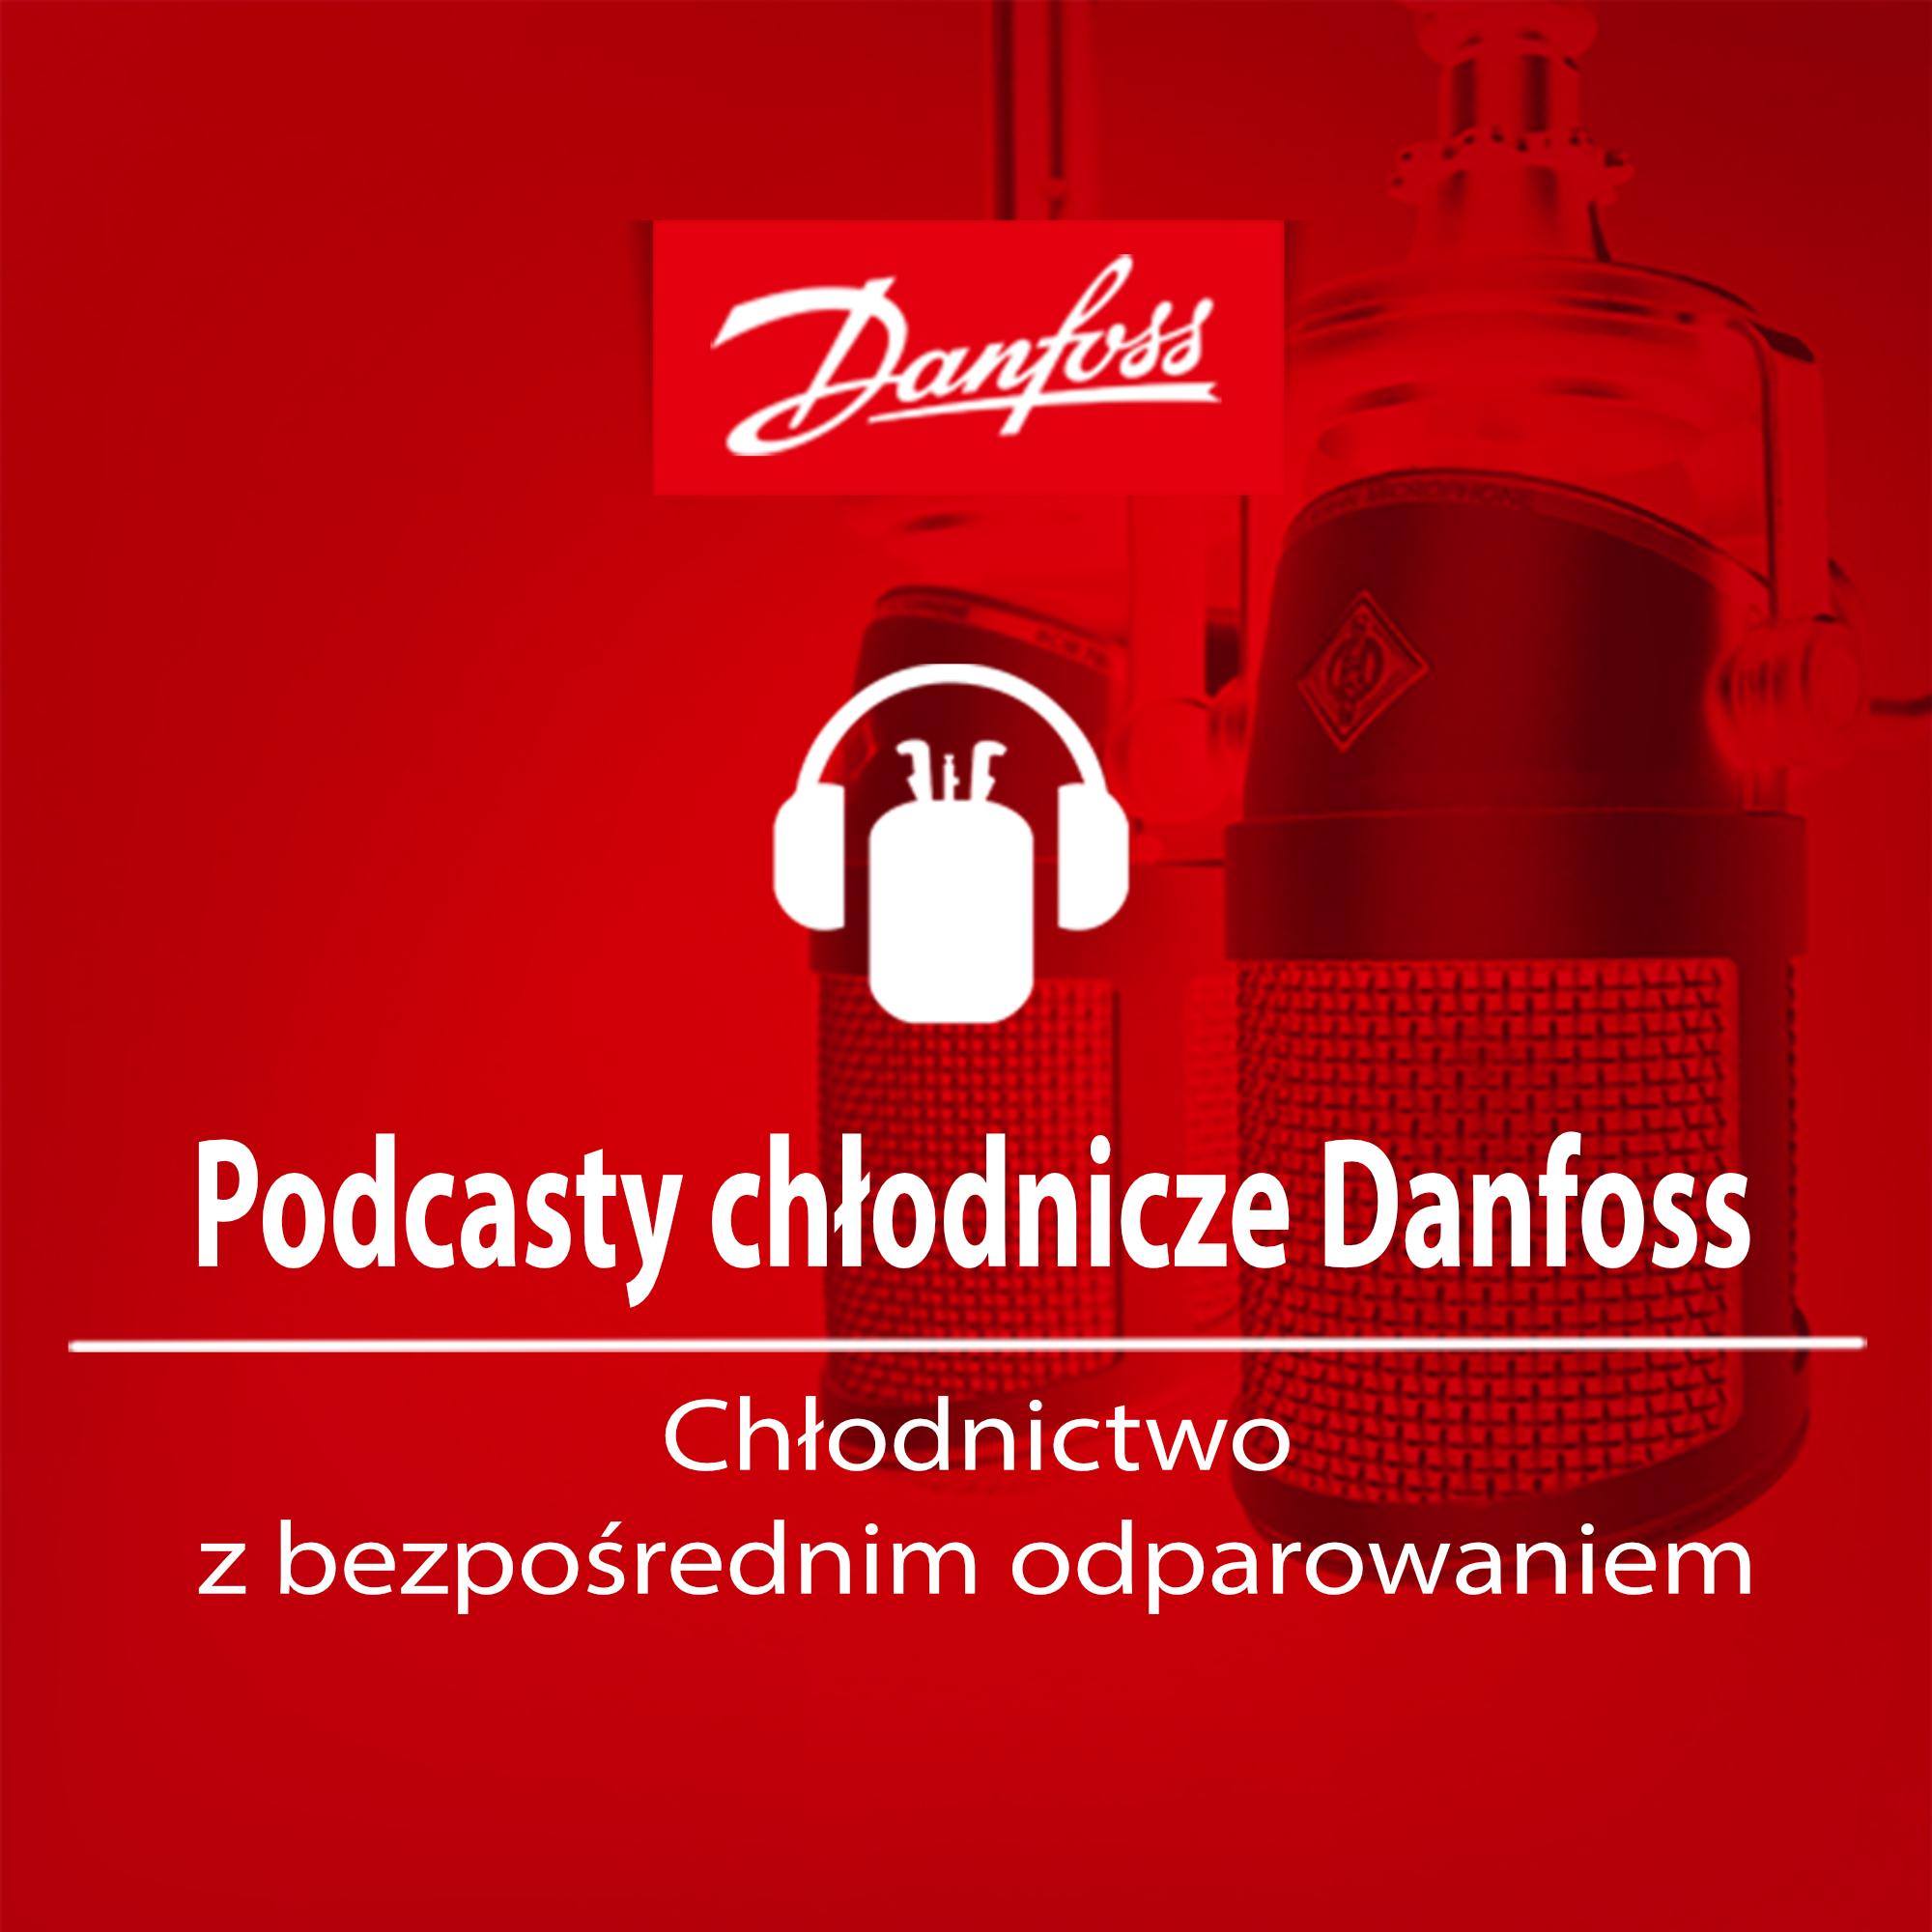 Show artwork for Podcasty chłodnicze Danfoss